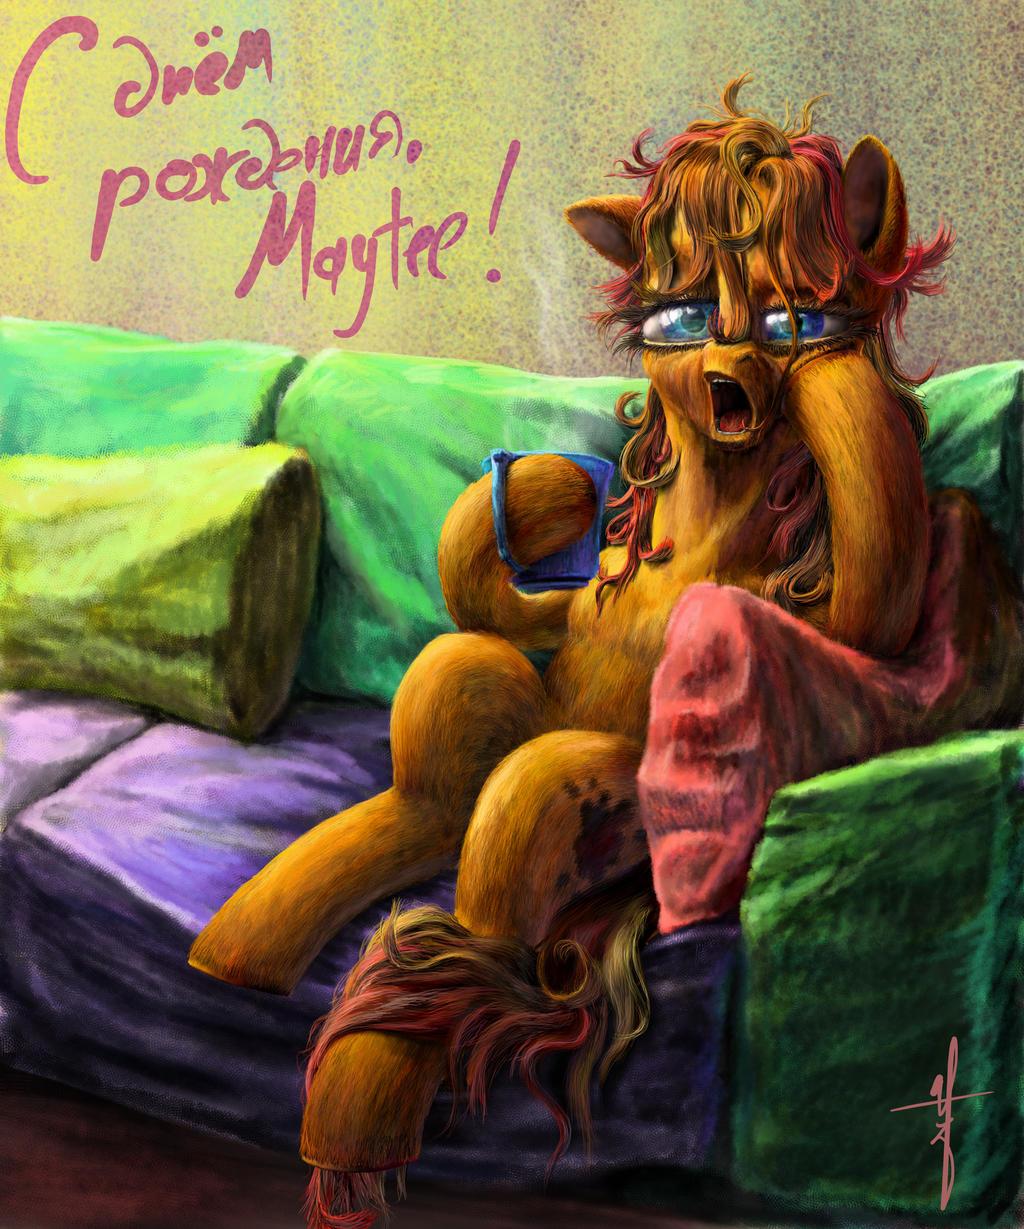 Maytee's OC by friendshipocalypse